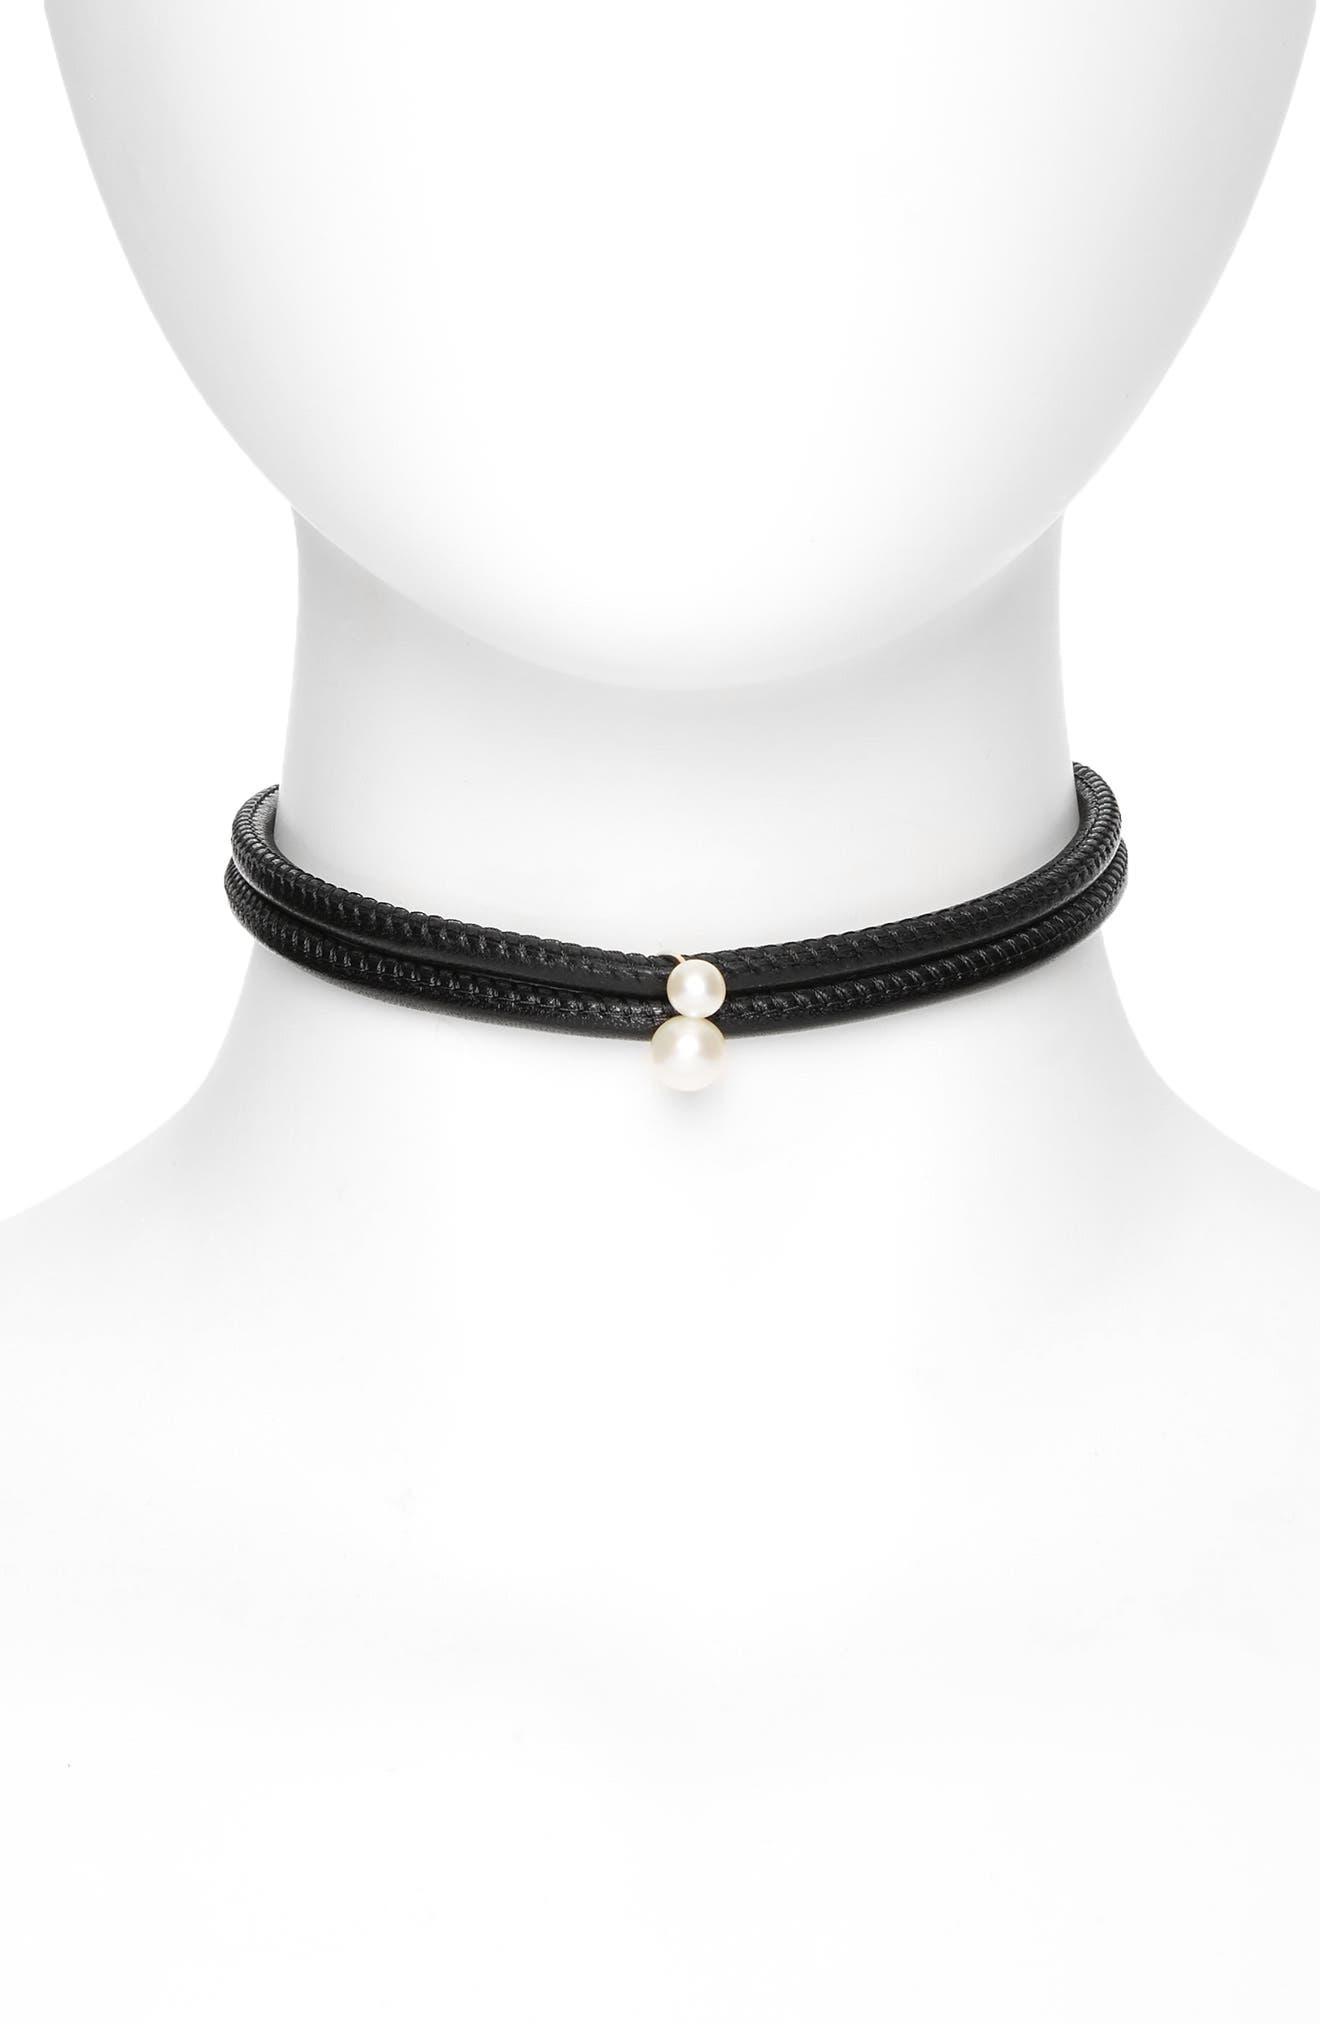 Alternate Image 1 Selected - Mizuki Leather & Akoya Pearl Choker Necklace